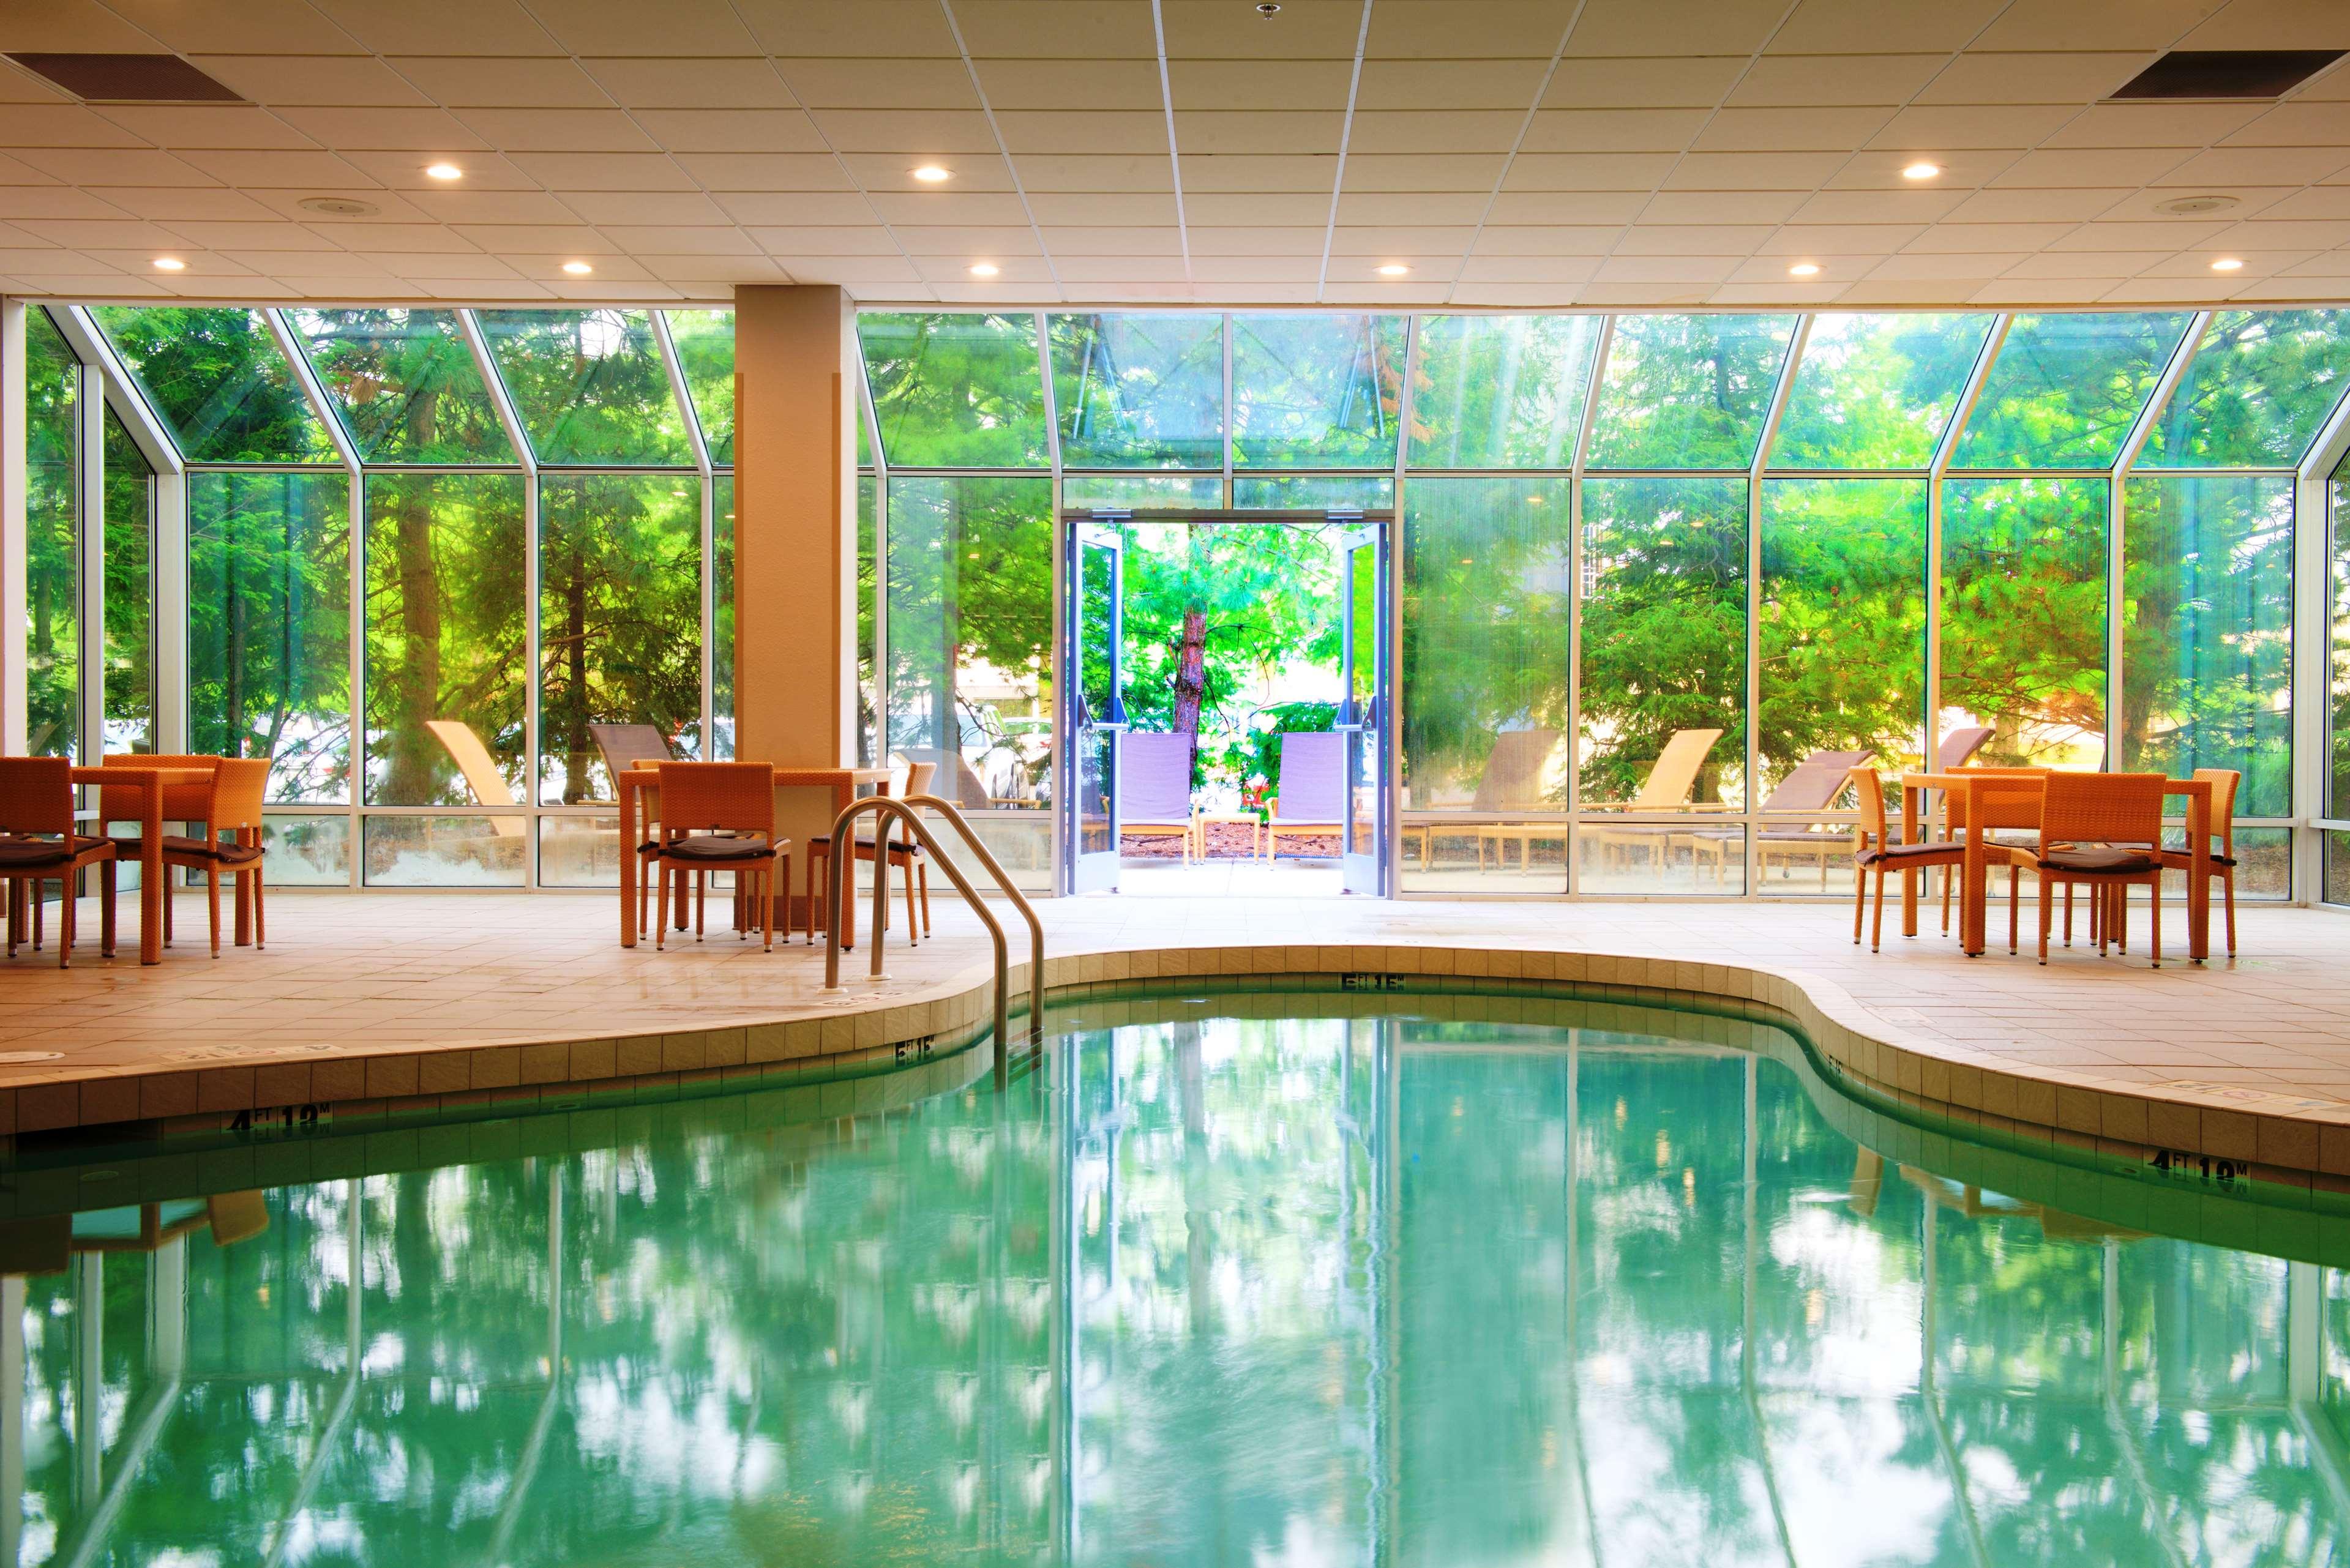 Embassy Suites by Hilton Cincinnati Northeast Blue Ash